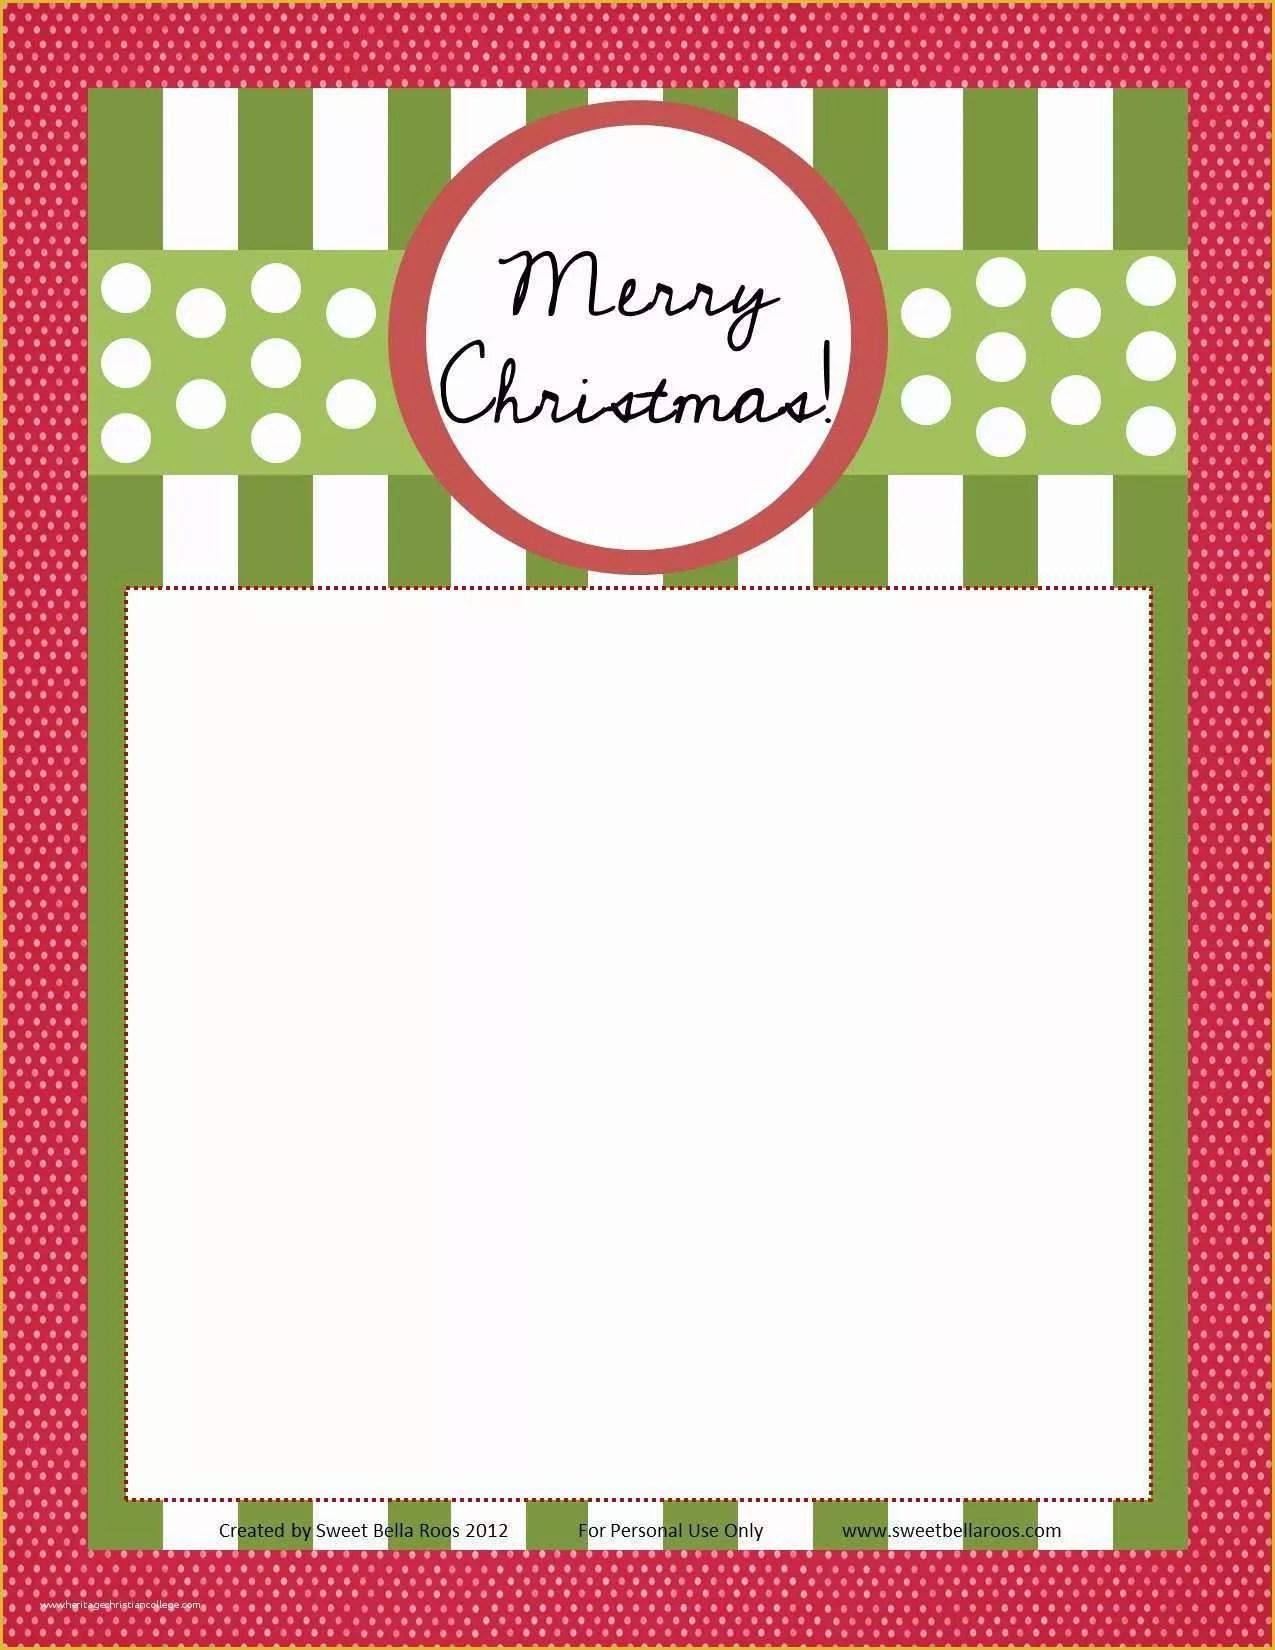 Dear Santa Letter Template Free Of Free Printable Dear